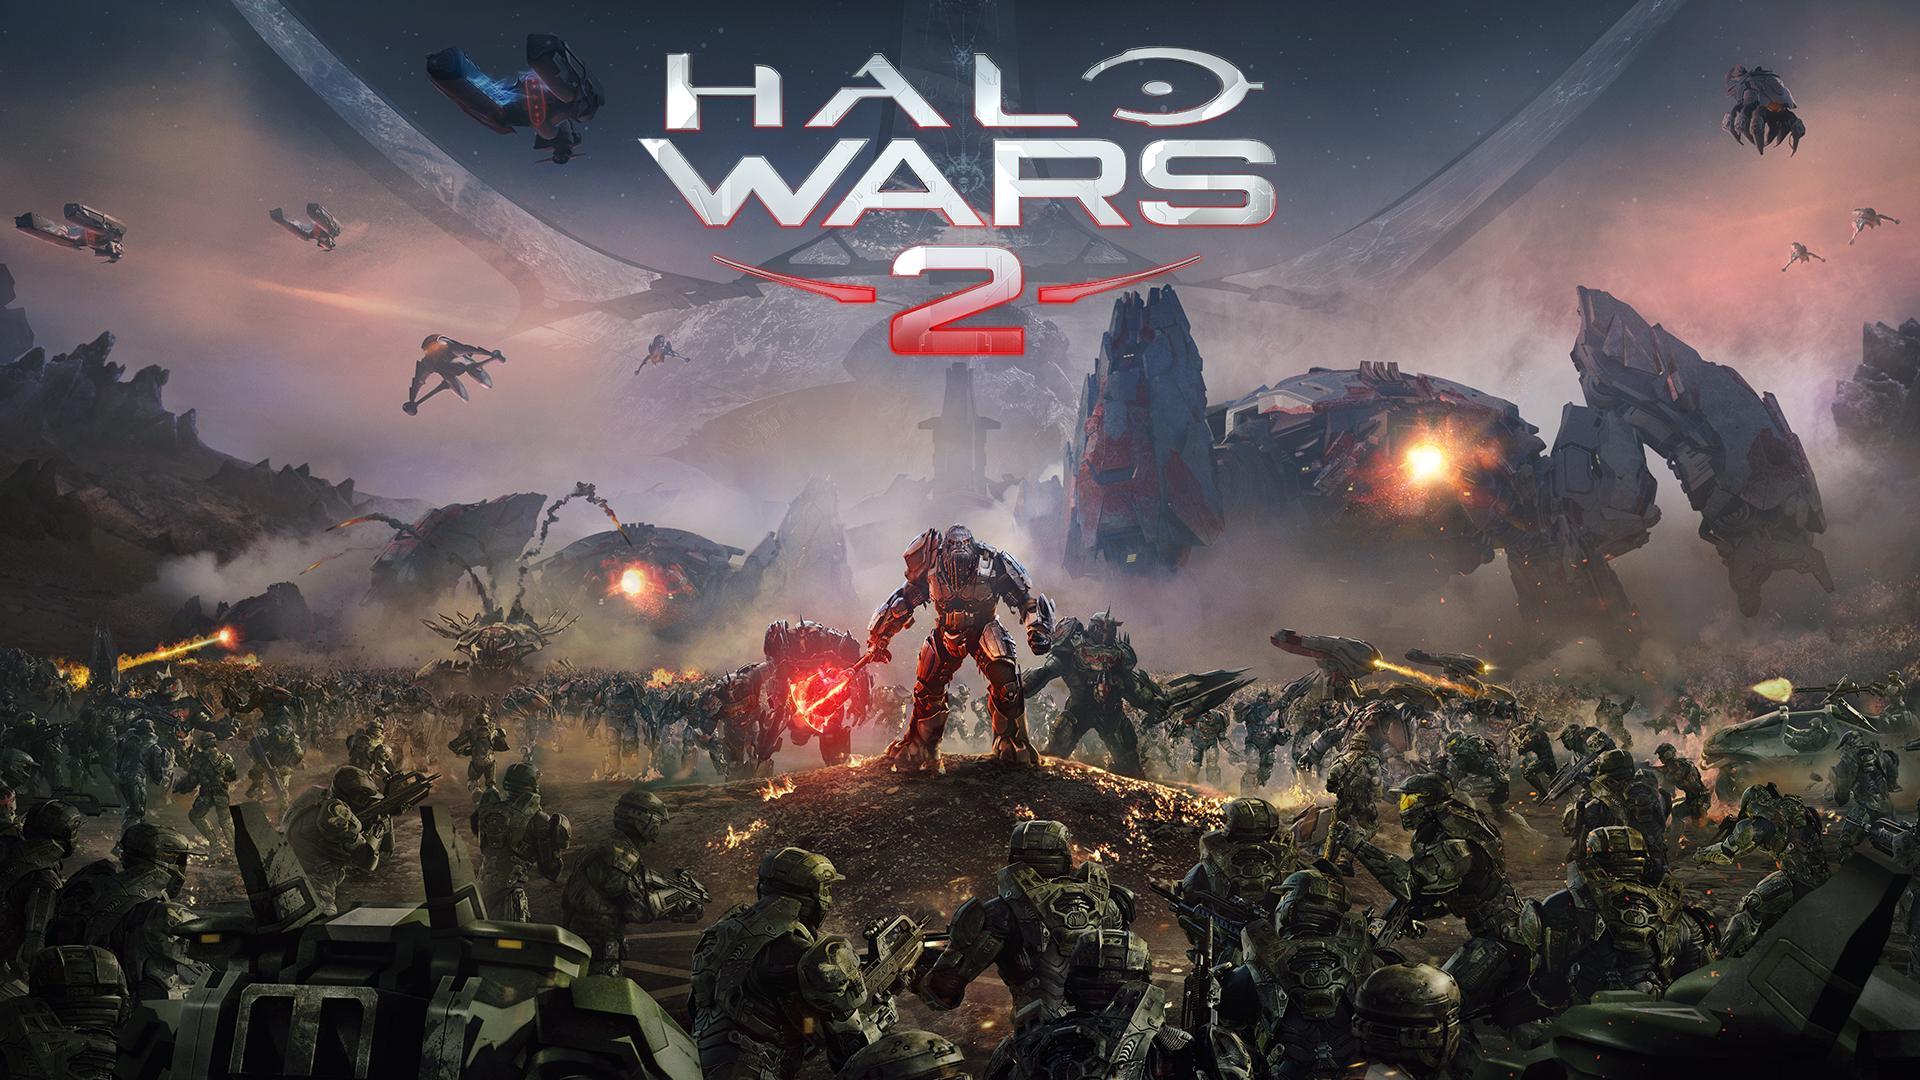 Jocuri în 2017 - Halo Wars